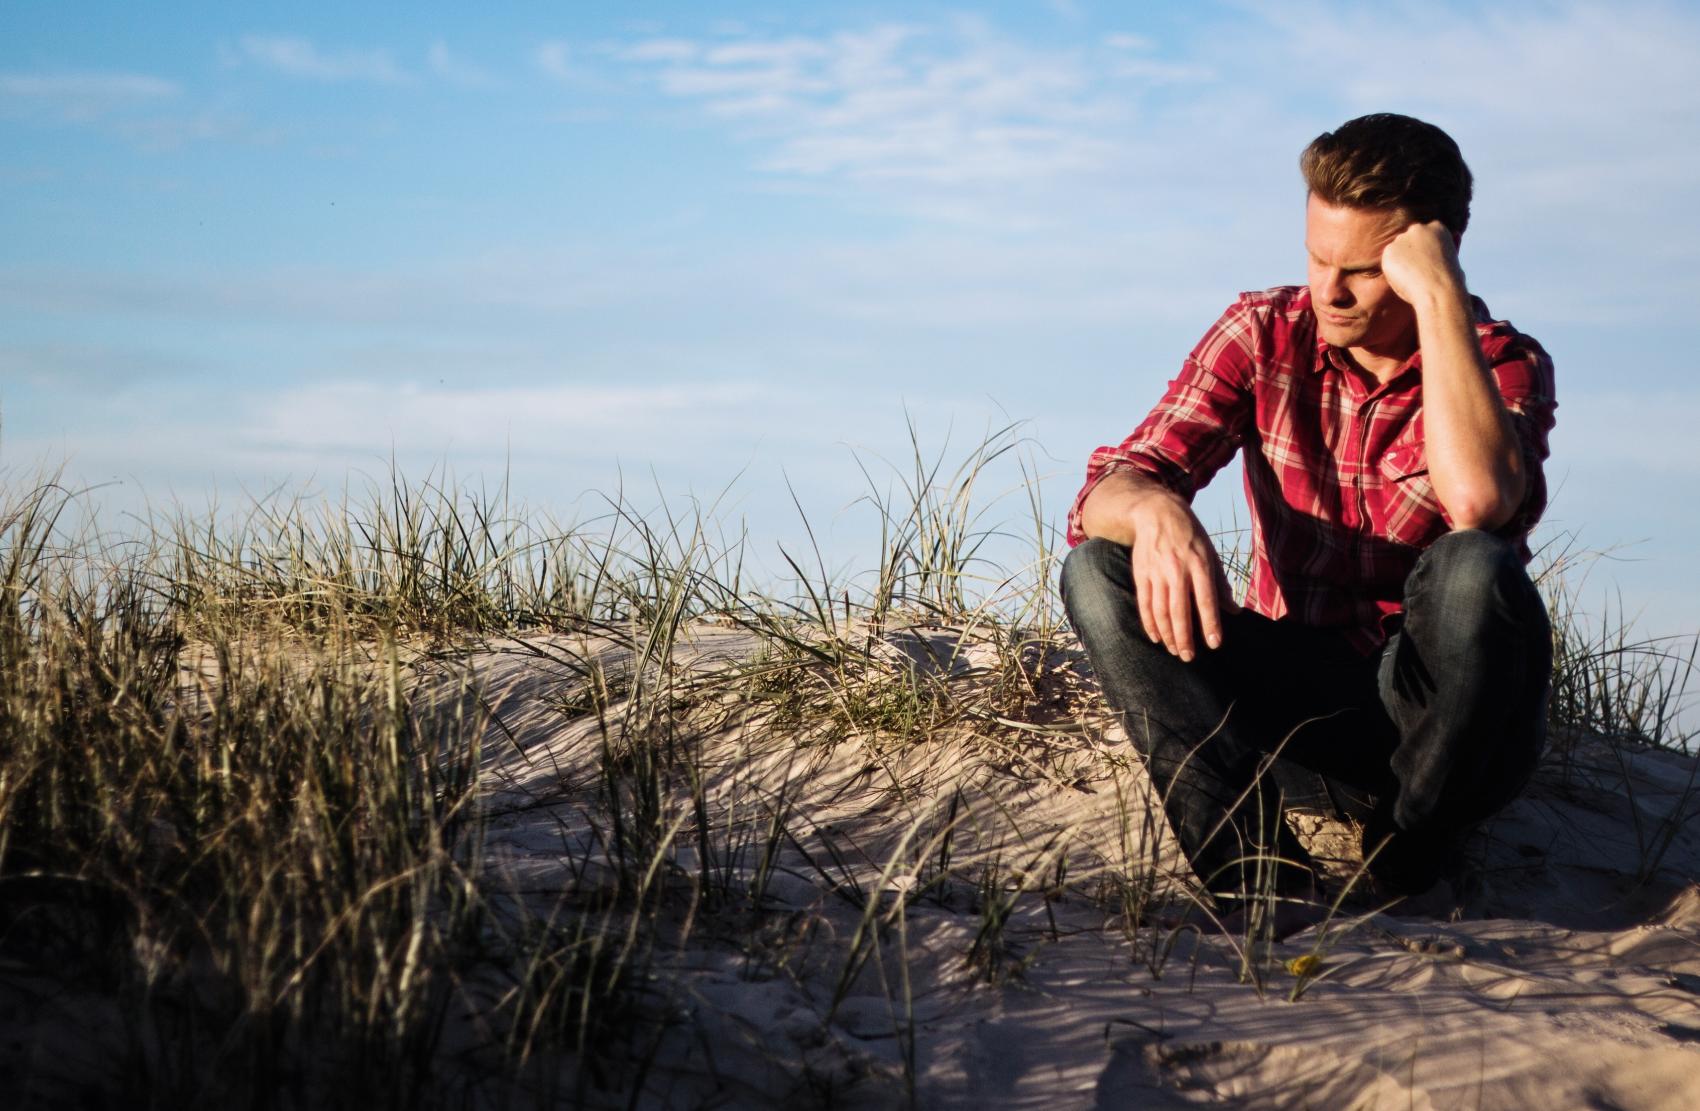 A man sitting with complex partial seizure symptoms